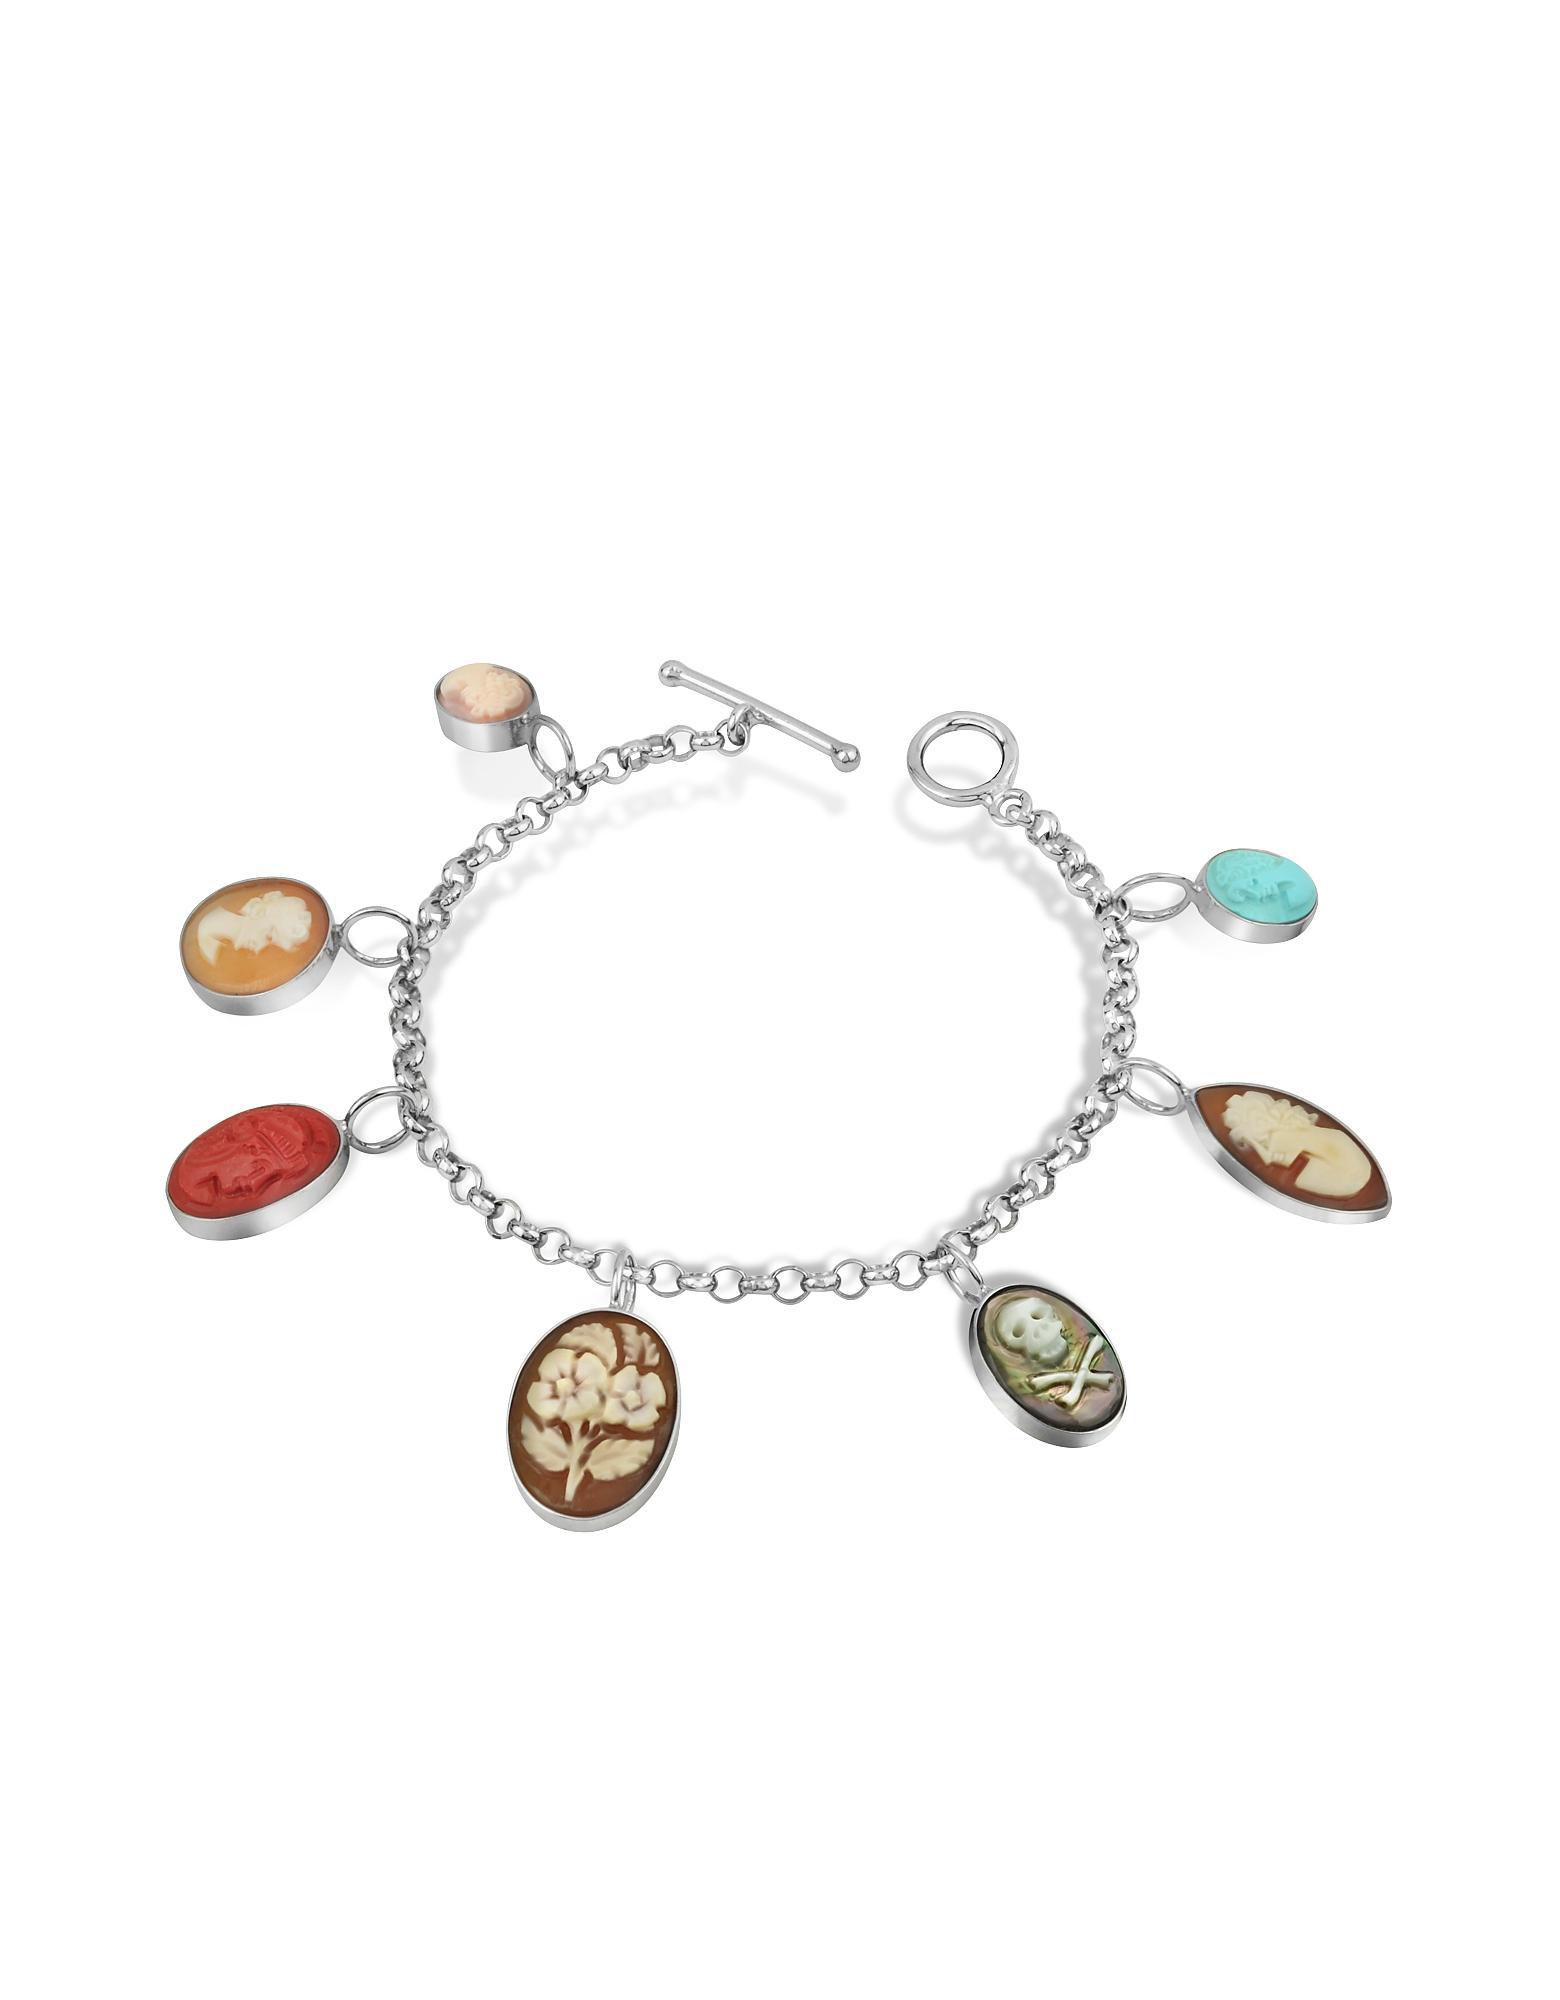 Mia & Beverly Cameo, Cameo Charm Bracelet